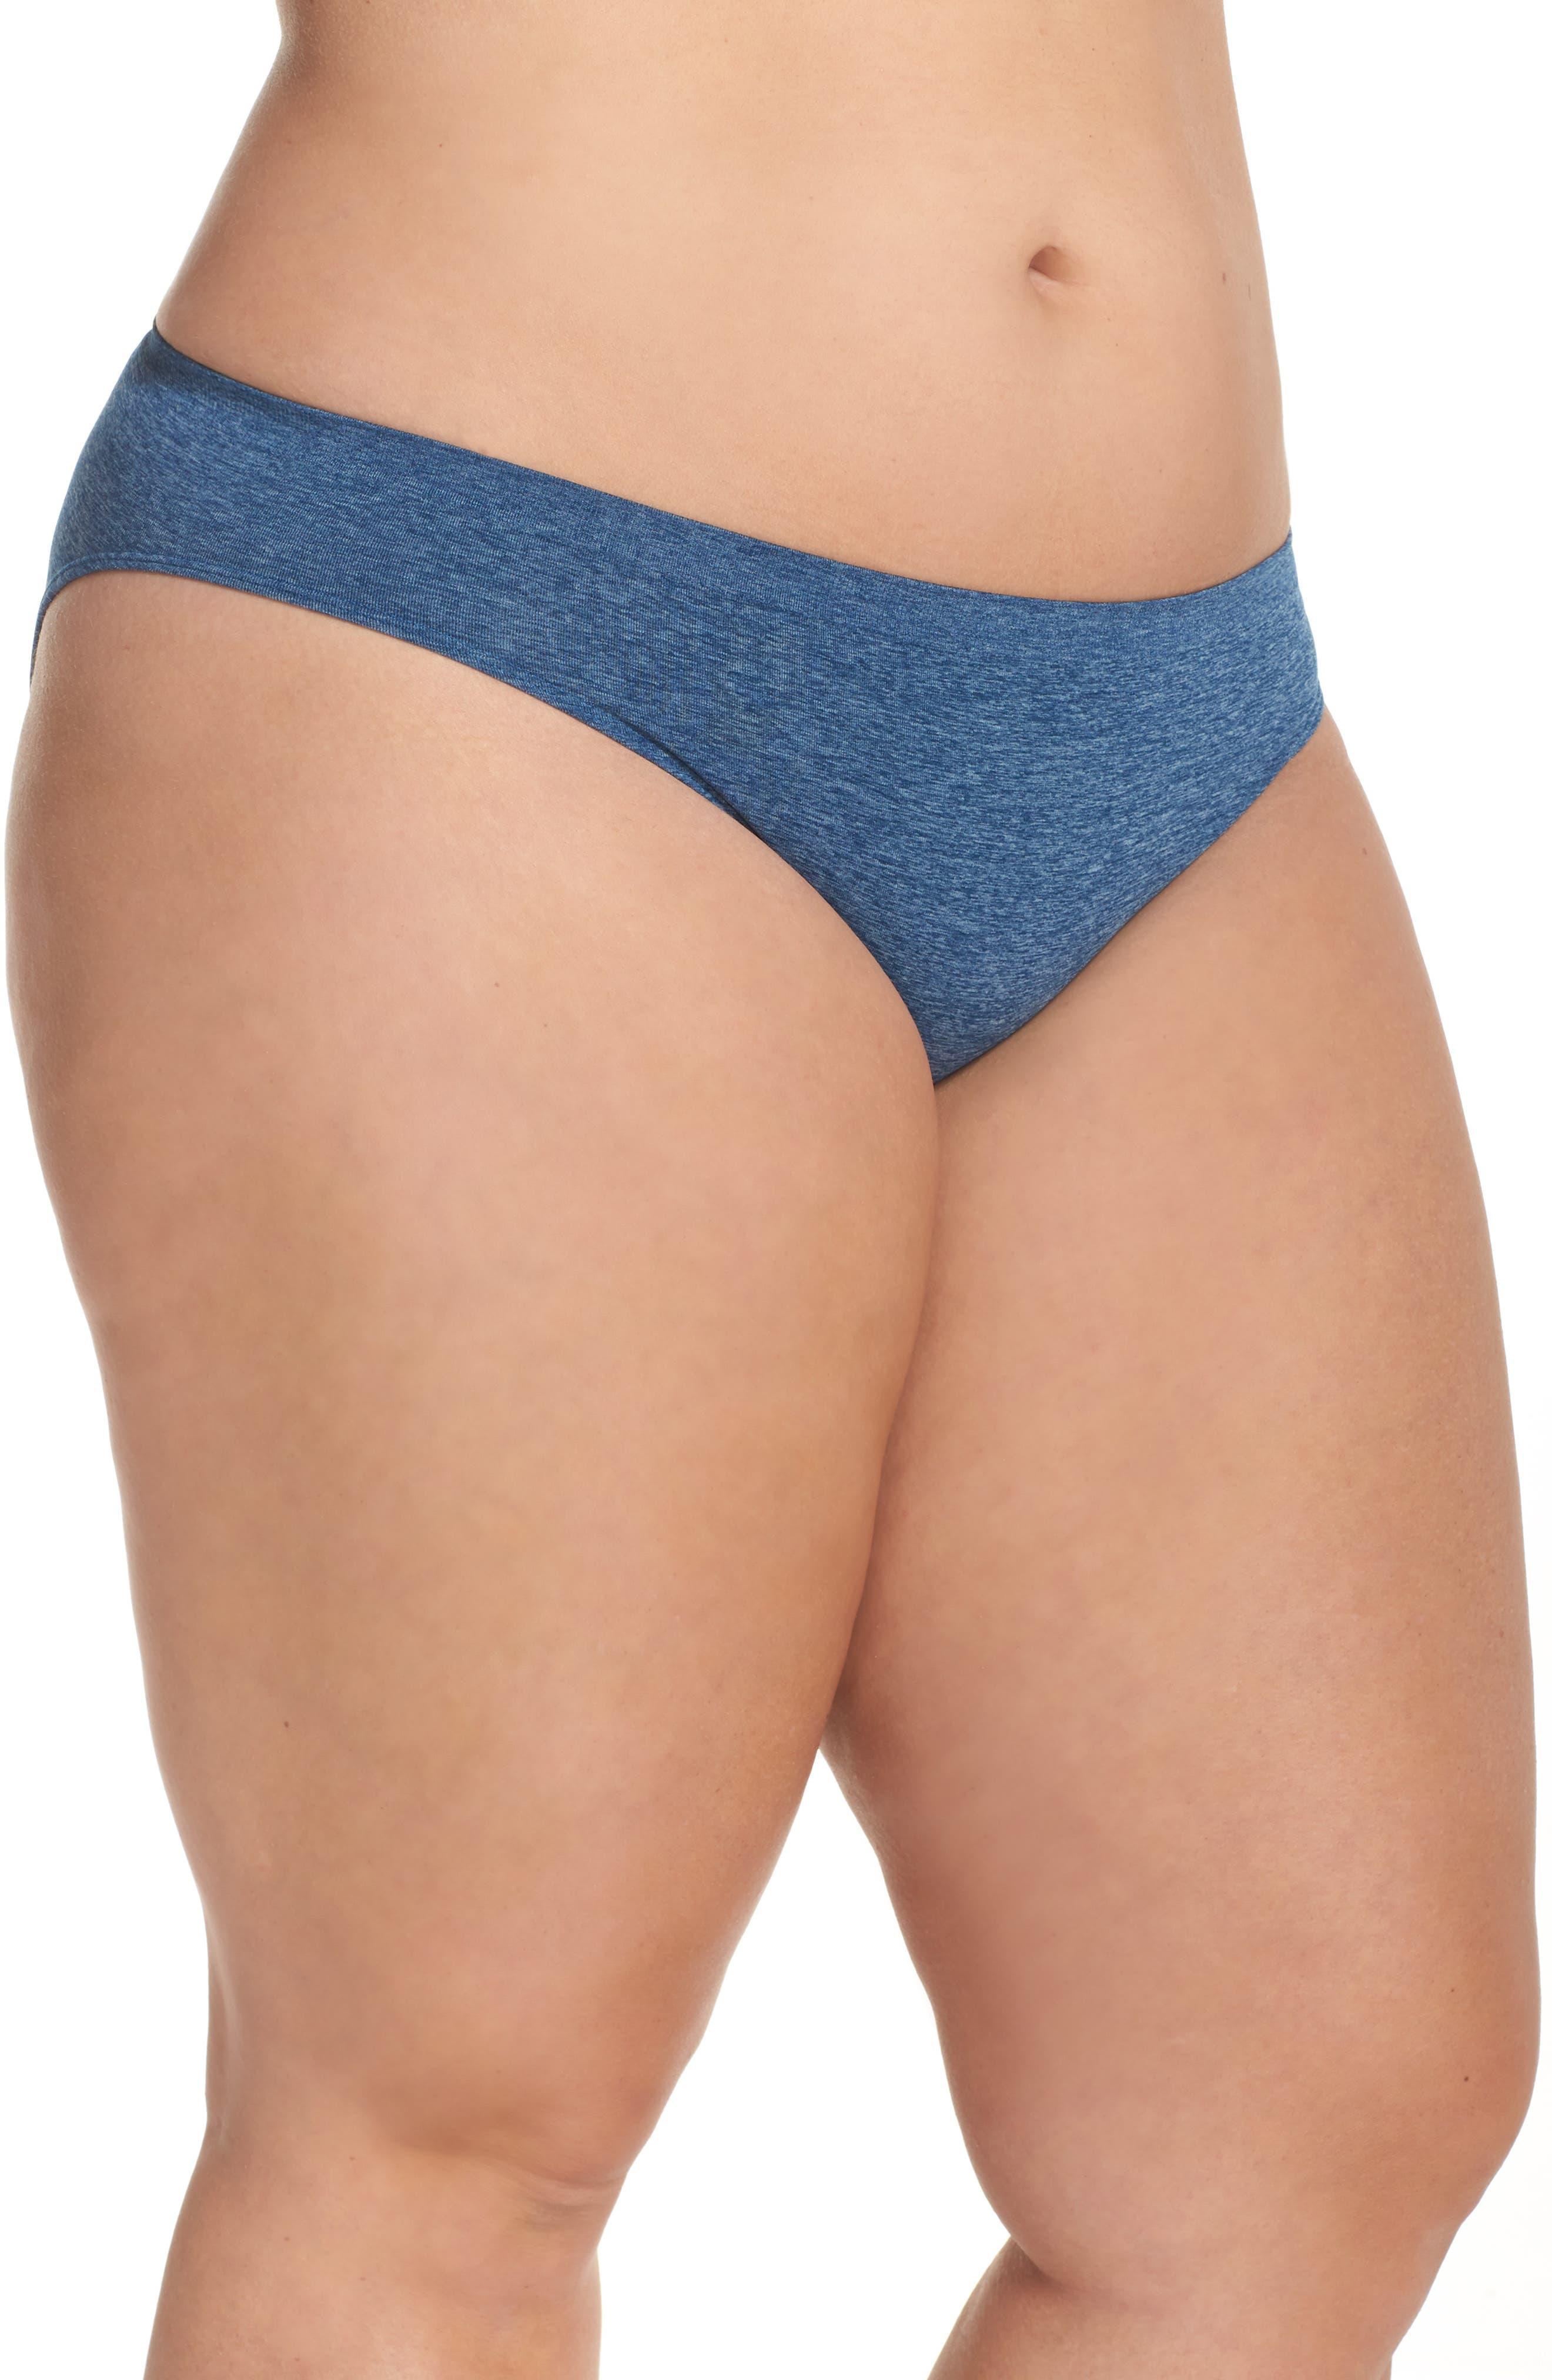 Alternate Image 3  - Halogen® Seamless Bikini (Plus Size) (3 for $33)